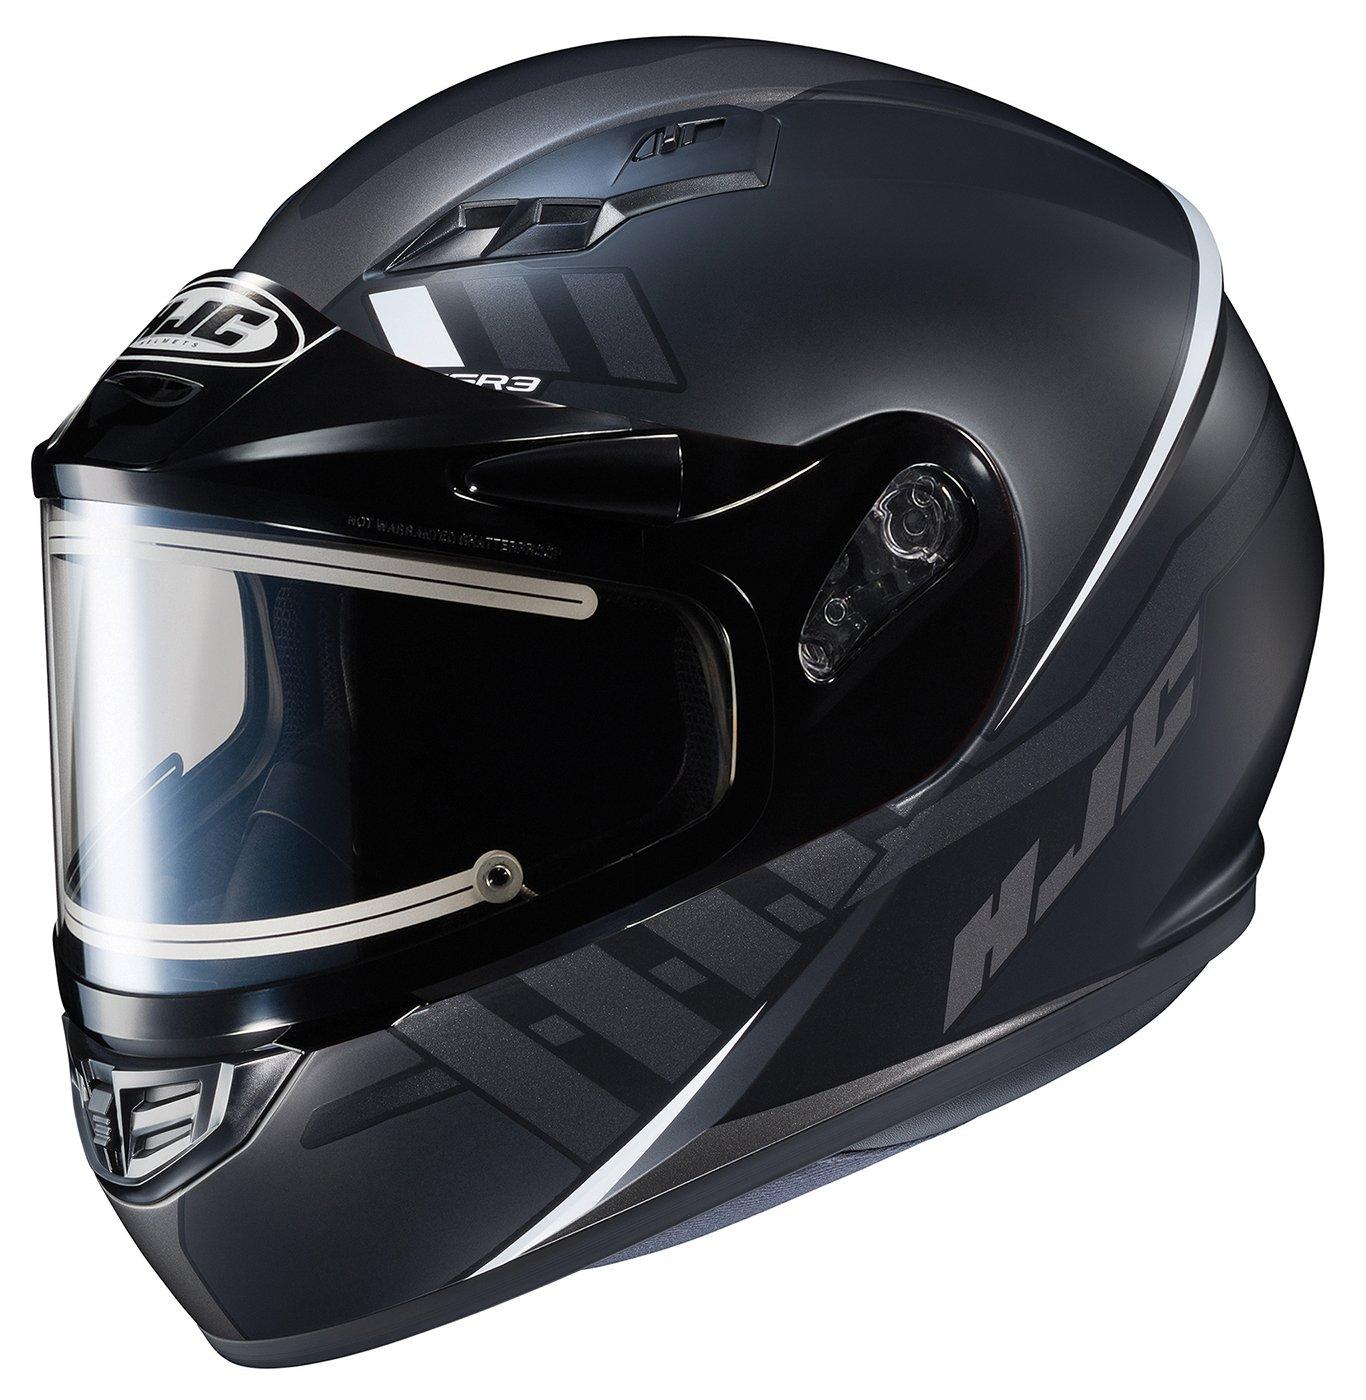 HJC Helmets Unisex-Adult Full-face Style CS-R3 Space Snow Helmet with Electric Shield Black//Orange X-Large 037-775